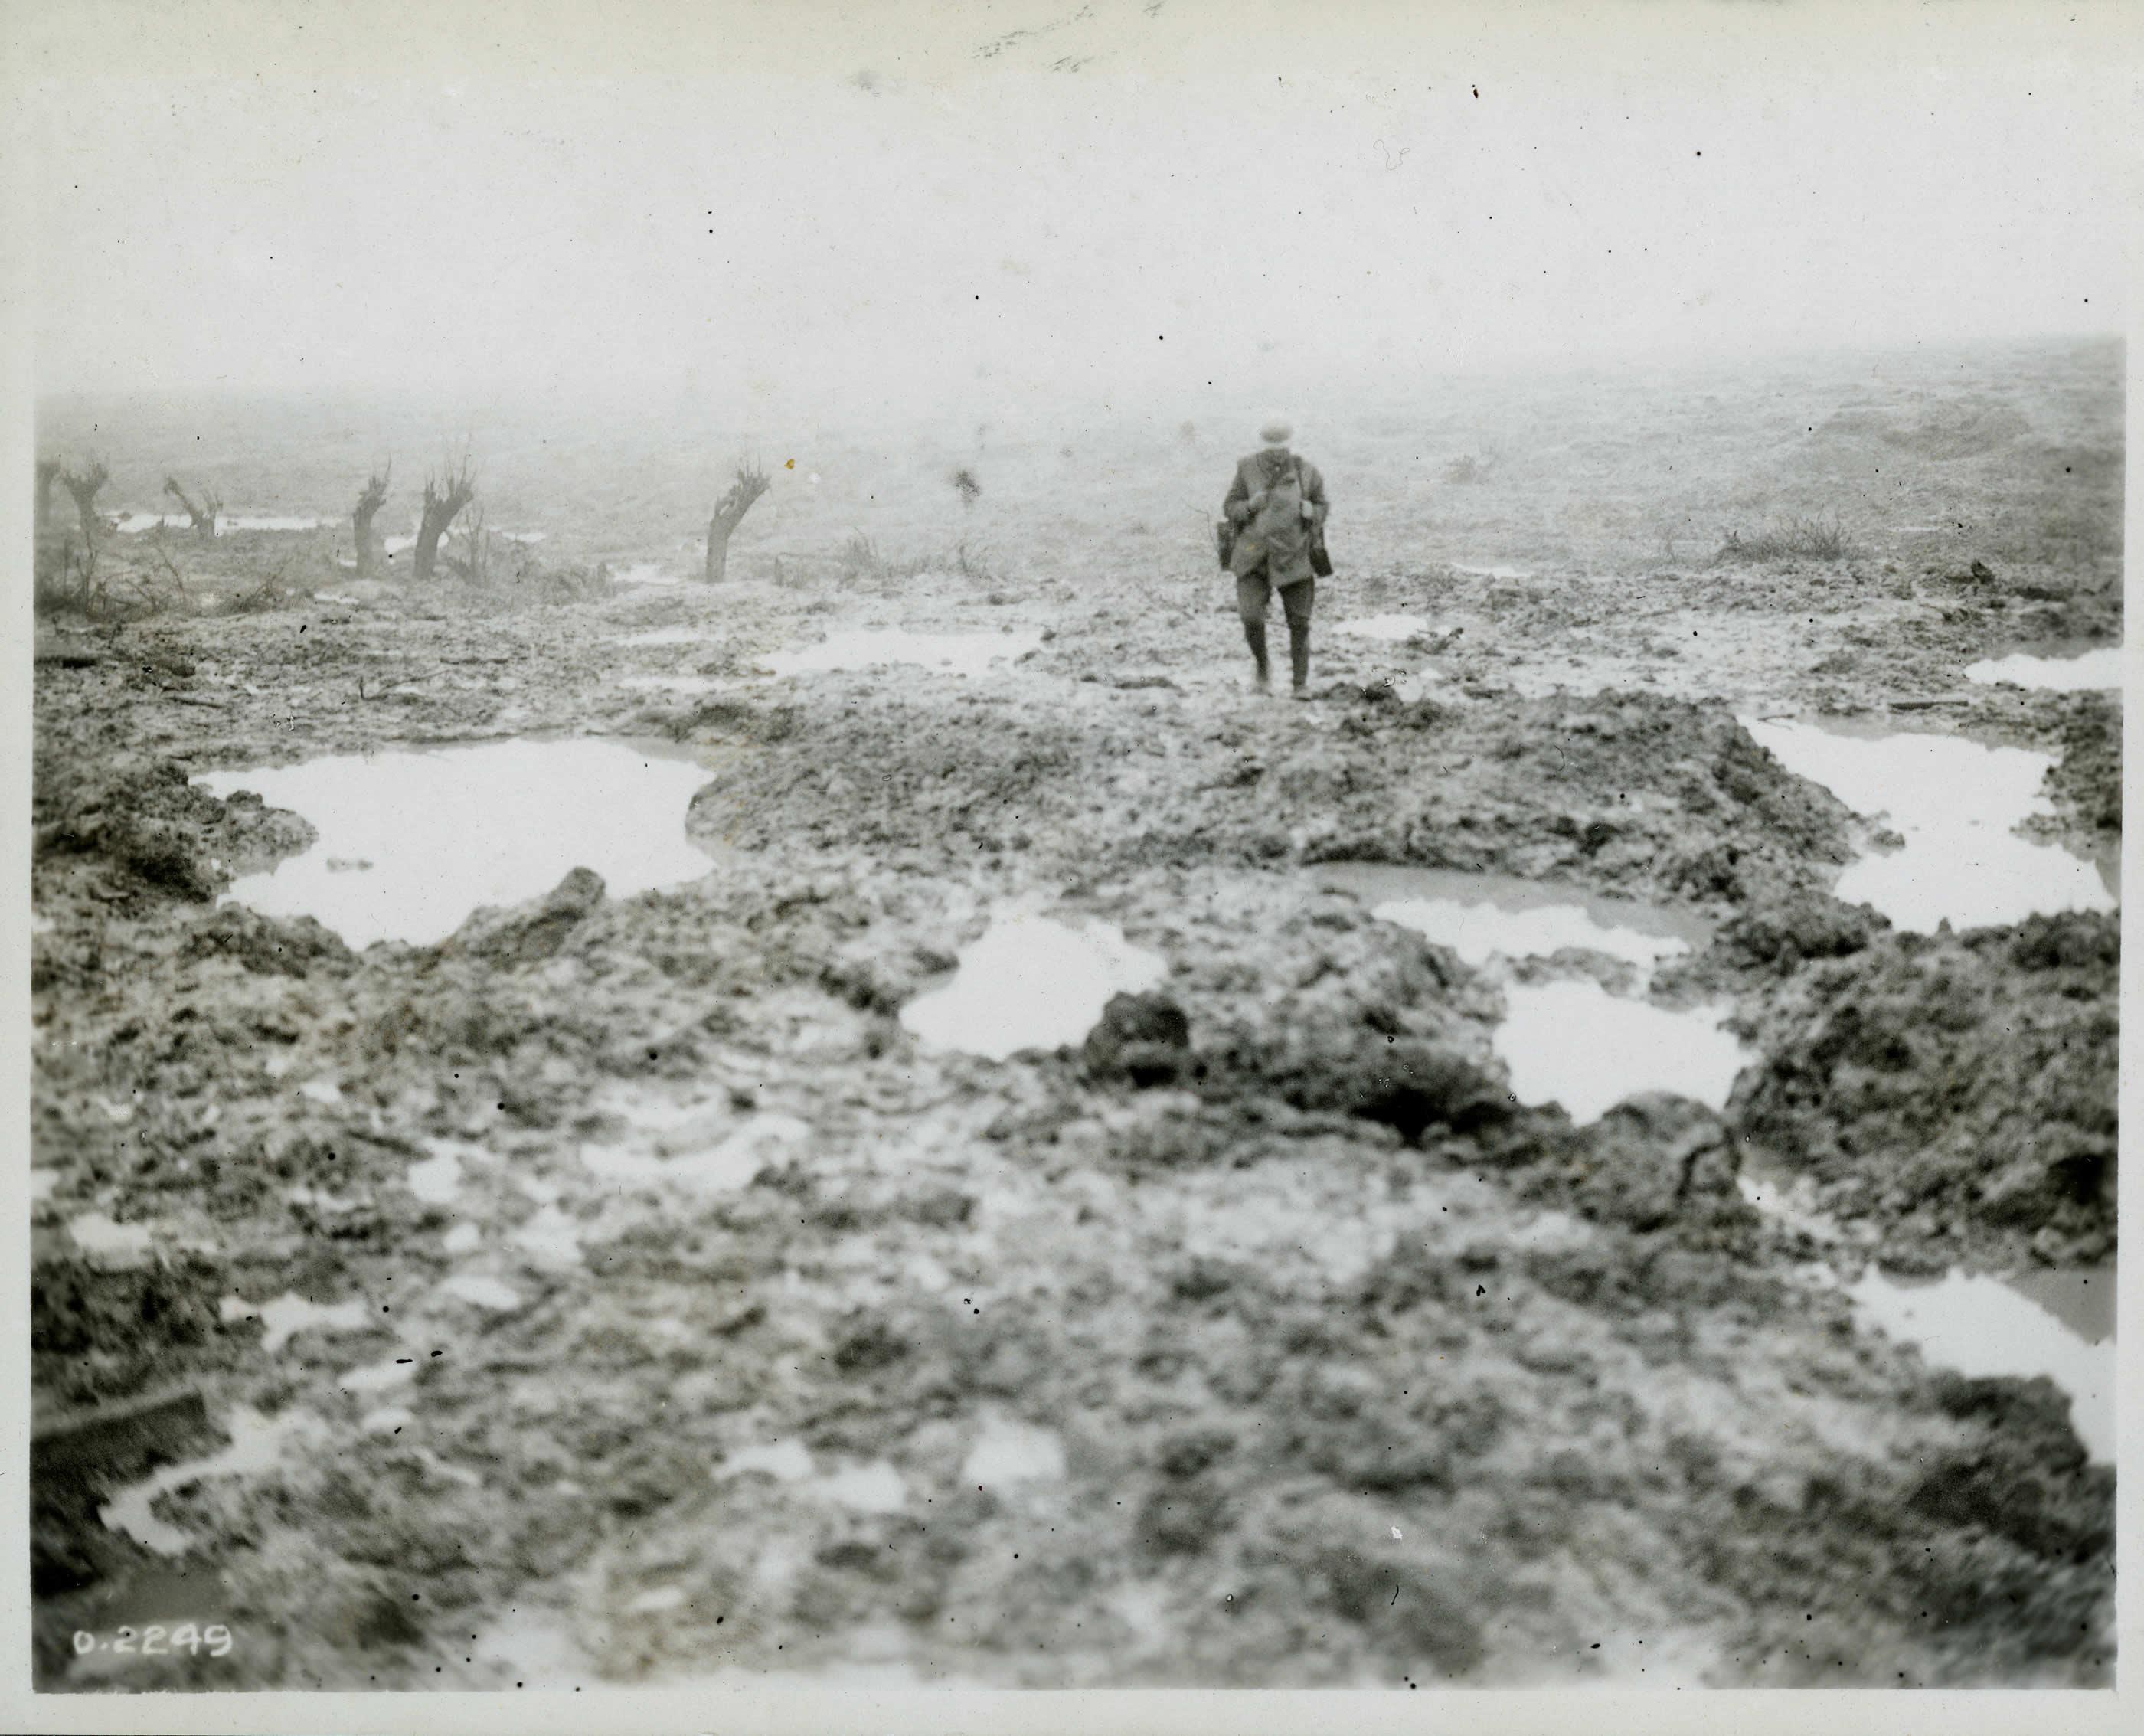 A Field of Mud